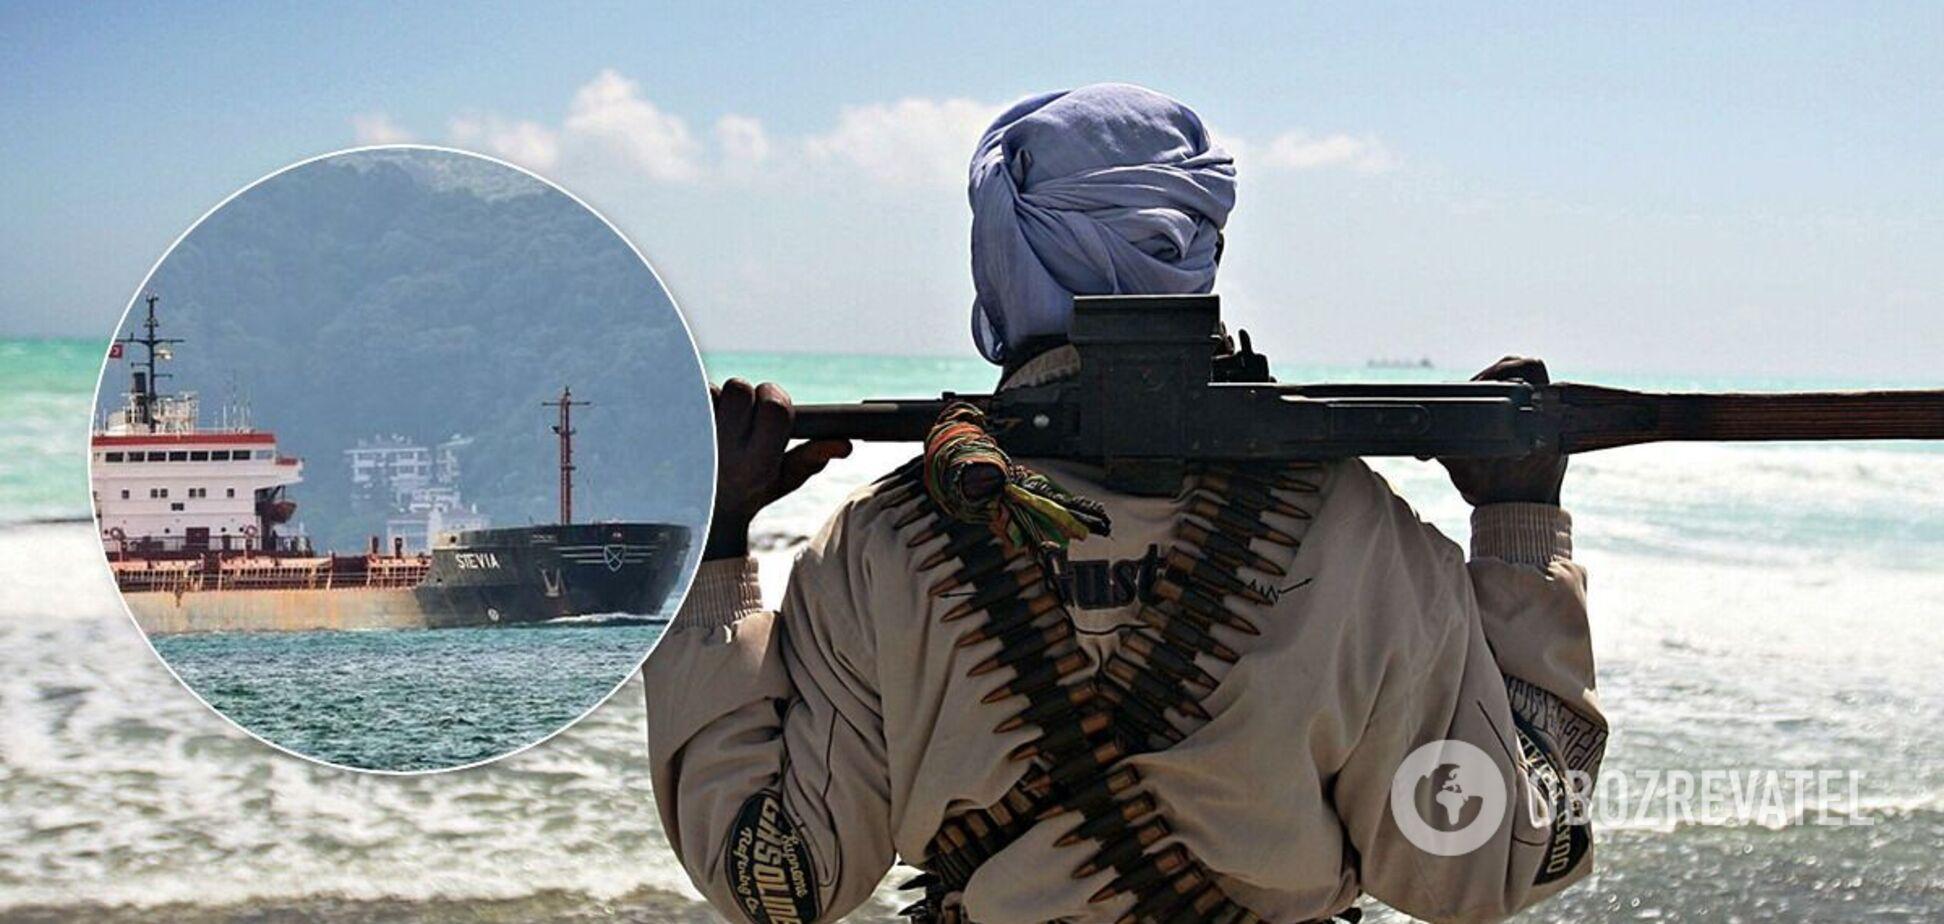 Пираты захватили судно у берегов Нигерии: в плен попали 6 украинцев